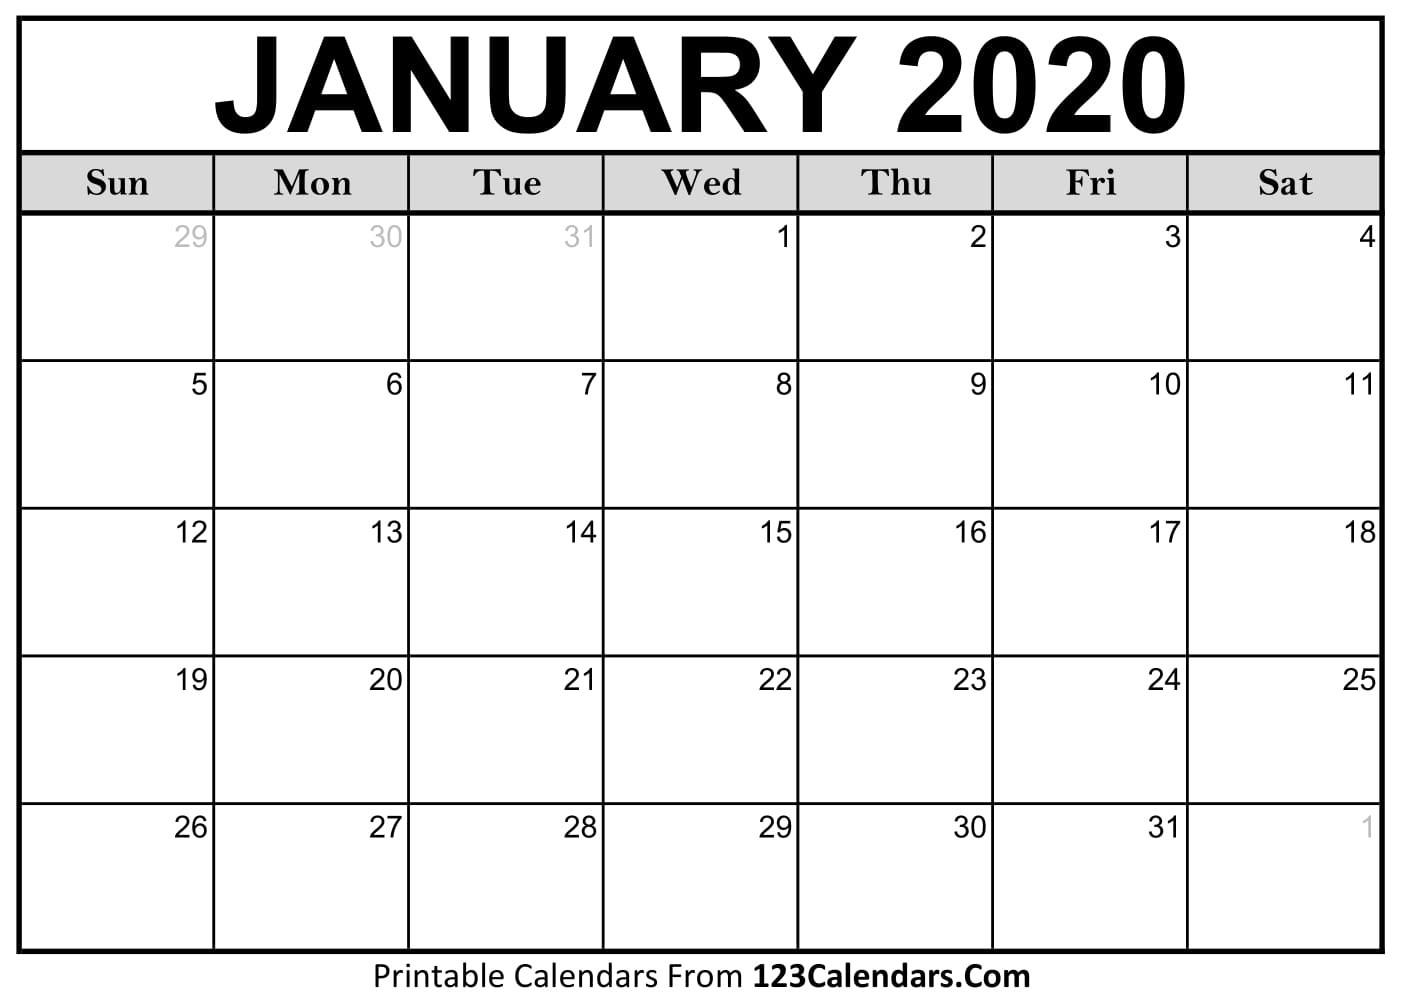 Free Printable Calendar | 123Calendars-Blank 2020 Calendar Template